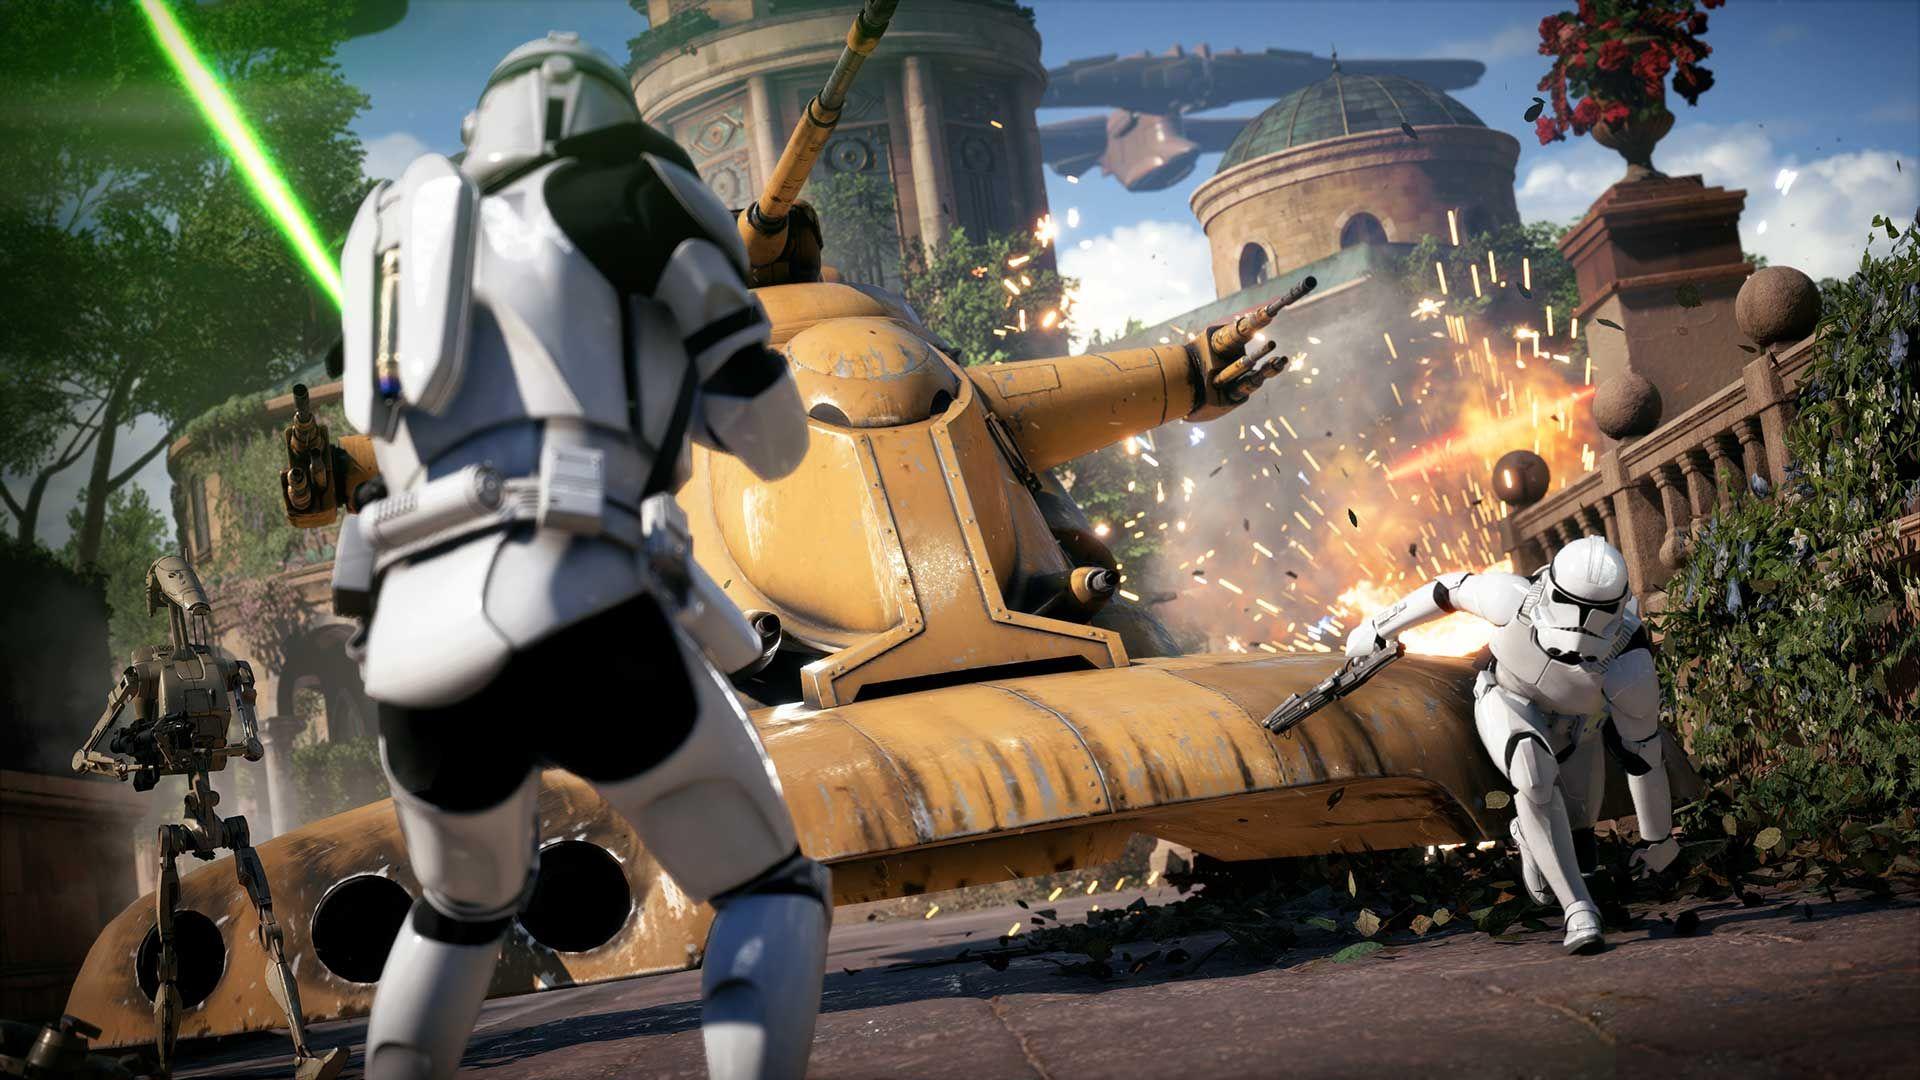 star wars battlefront 2 pc download 2017 free